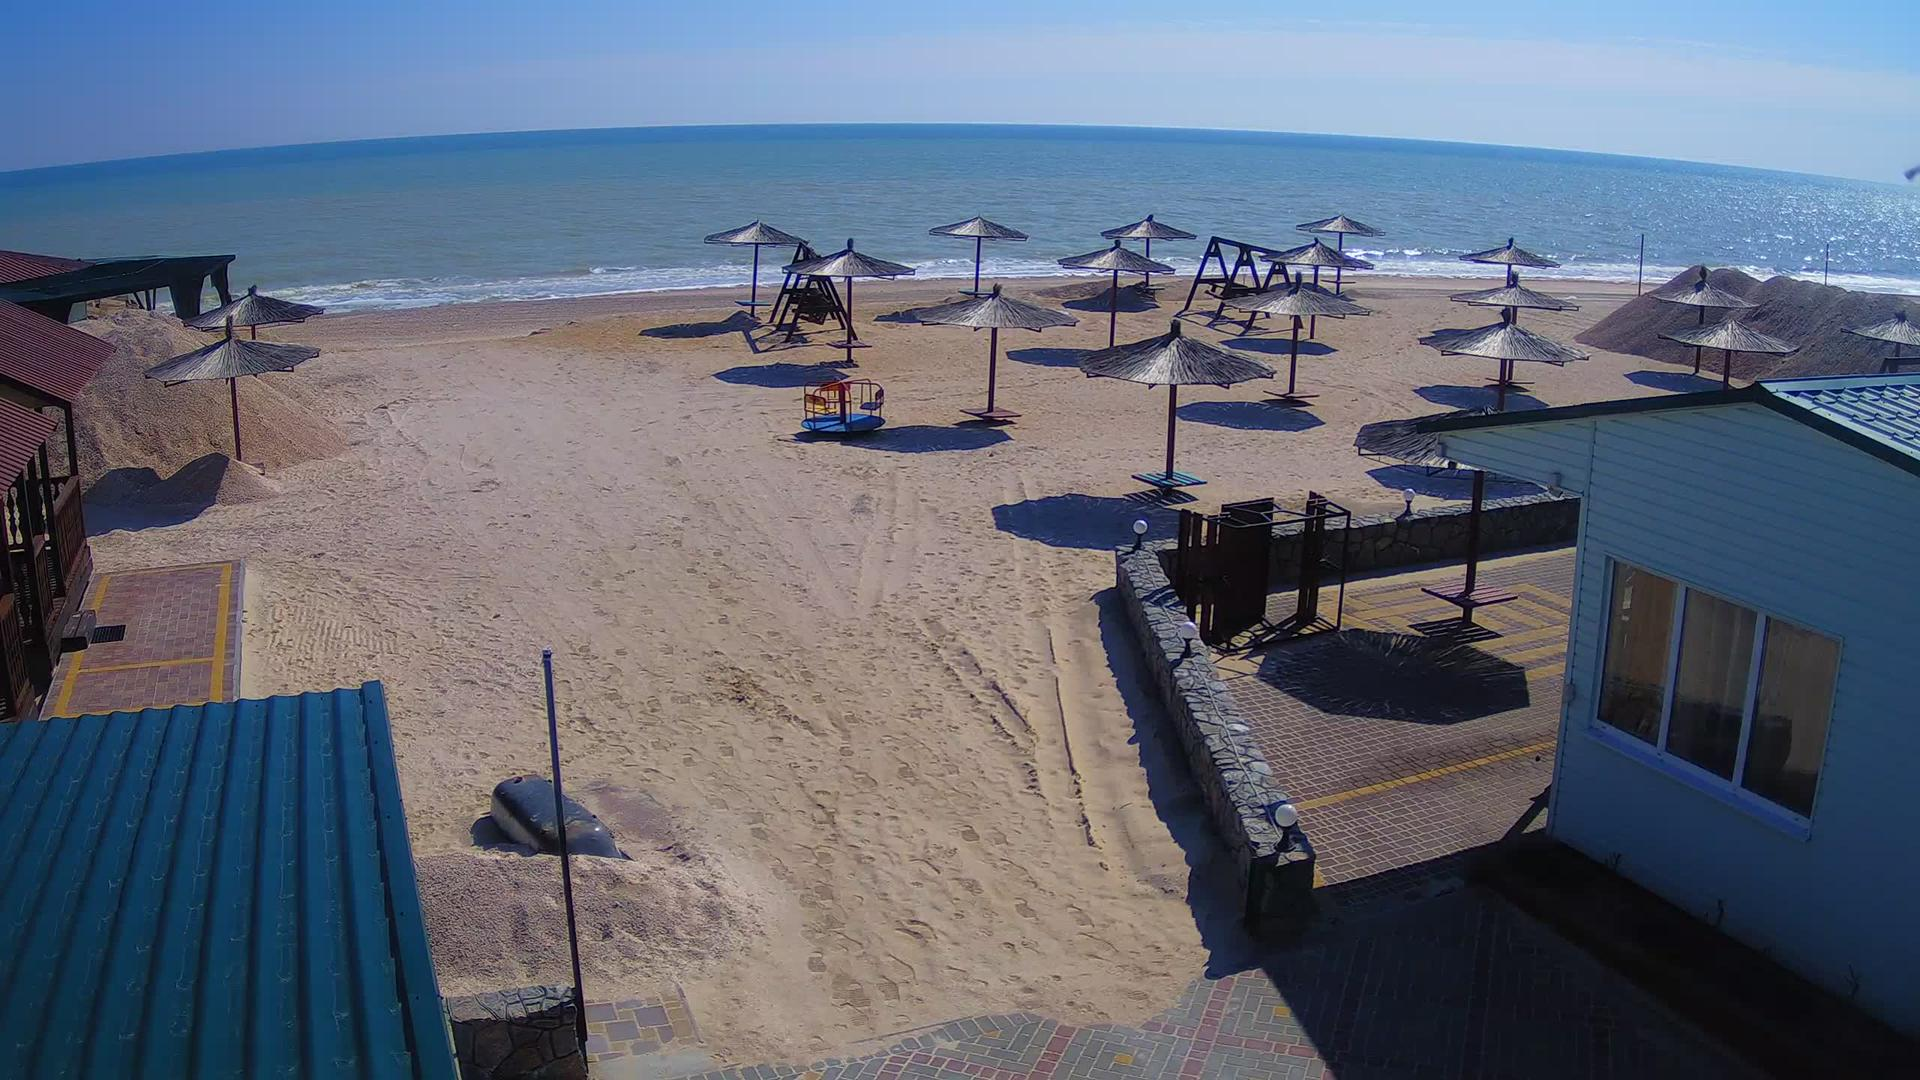 Webcam Stepok › West: Азовское море − база отдыха Гавайи